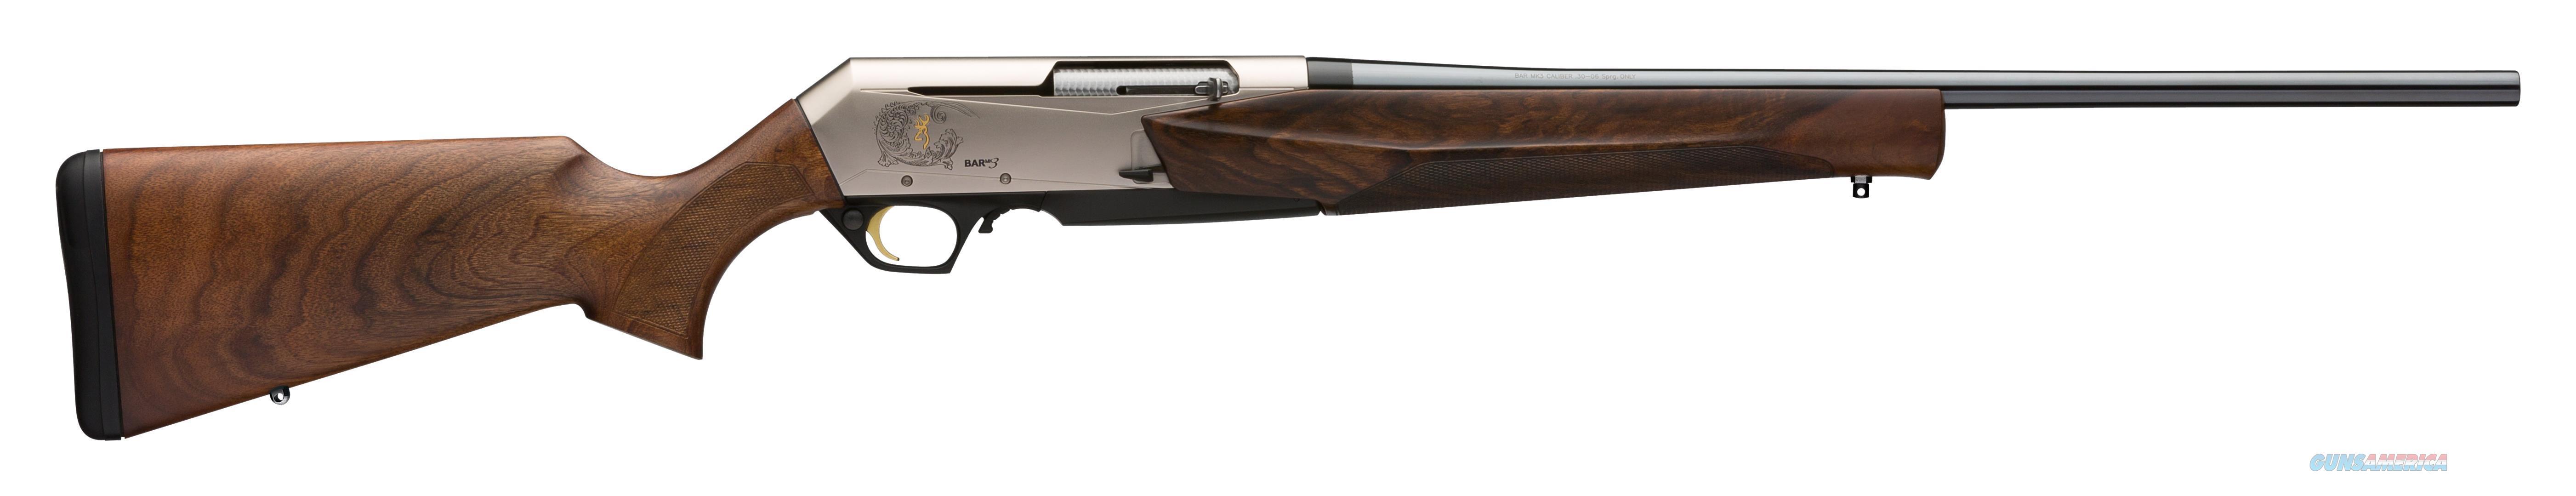 "Browning 031047246 Bar Mk3 Semi-Automatic 300 Winchester Short Magnum (Wsm) 23"" 3+1 Walnut Stk Nickel Receiver/Blued Barrel 031047246  Guns > Rifles > B Misc Rifles"